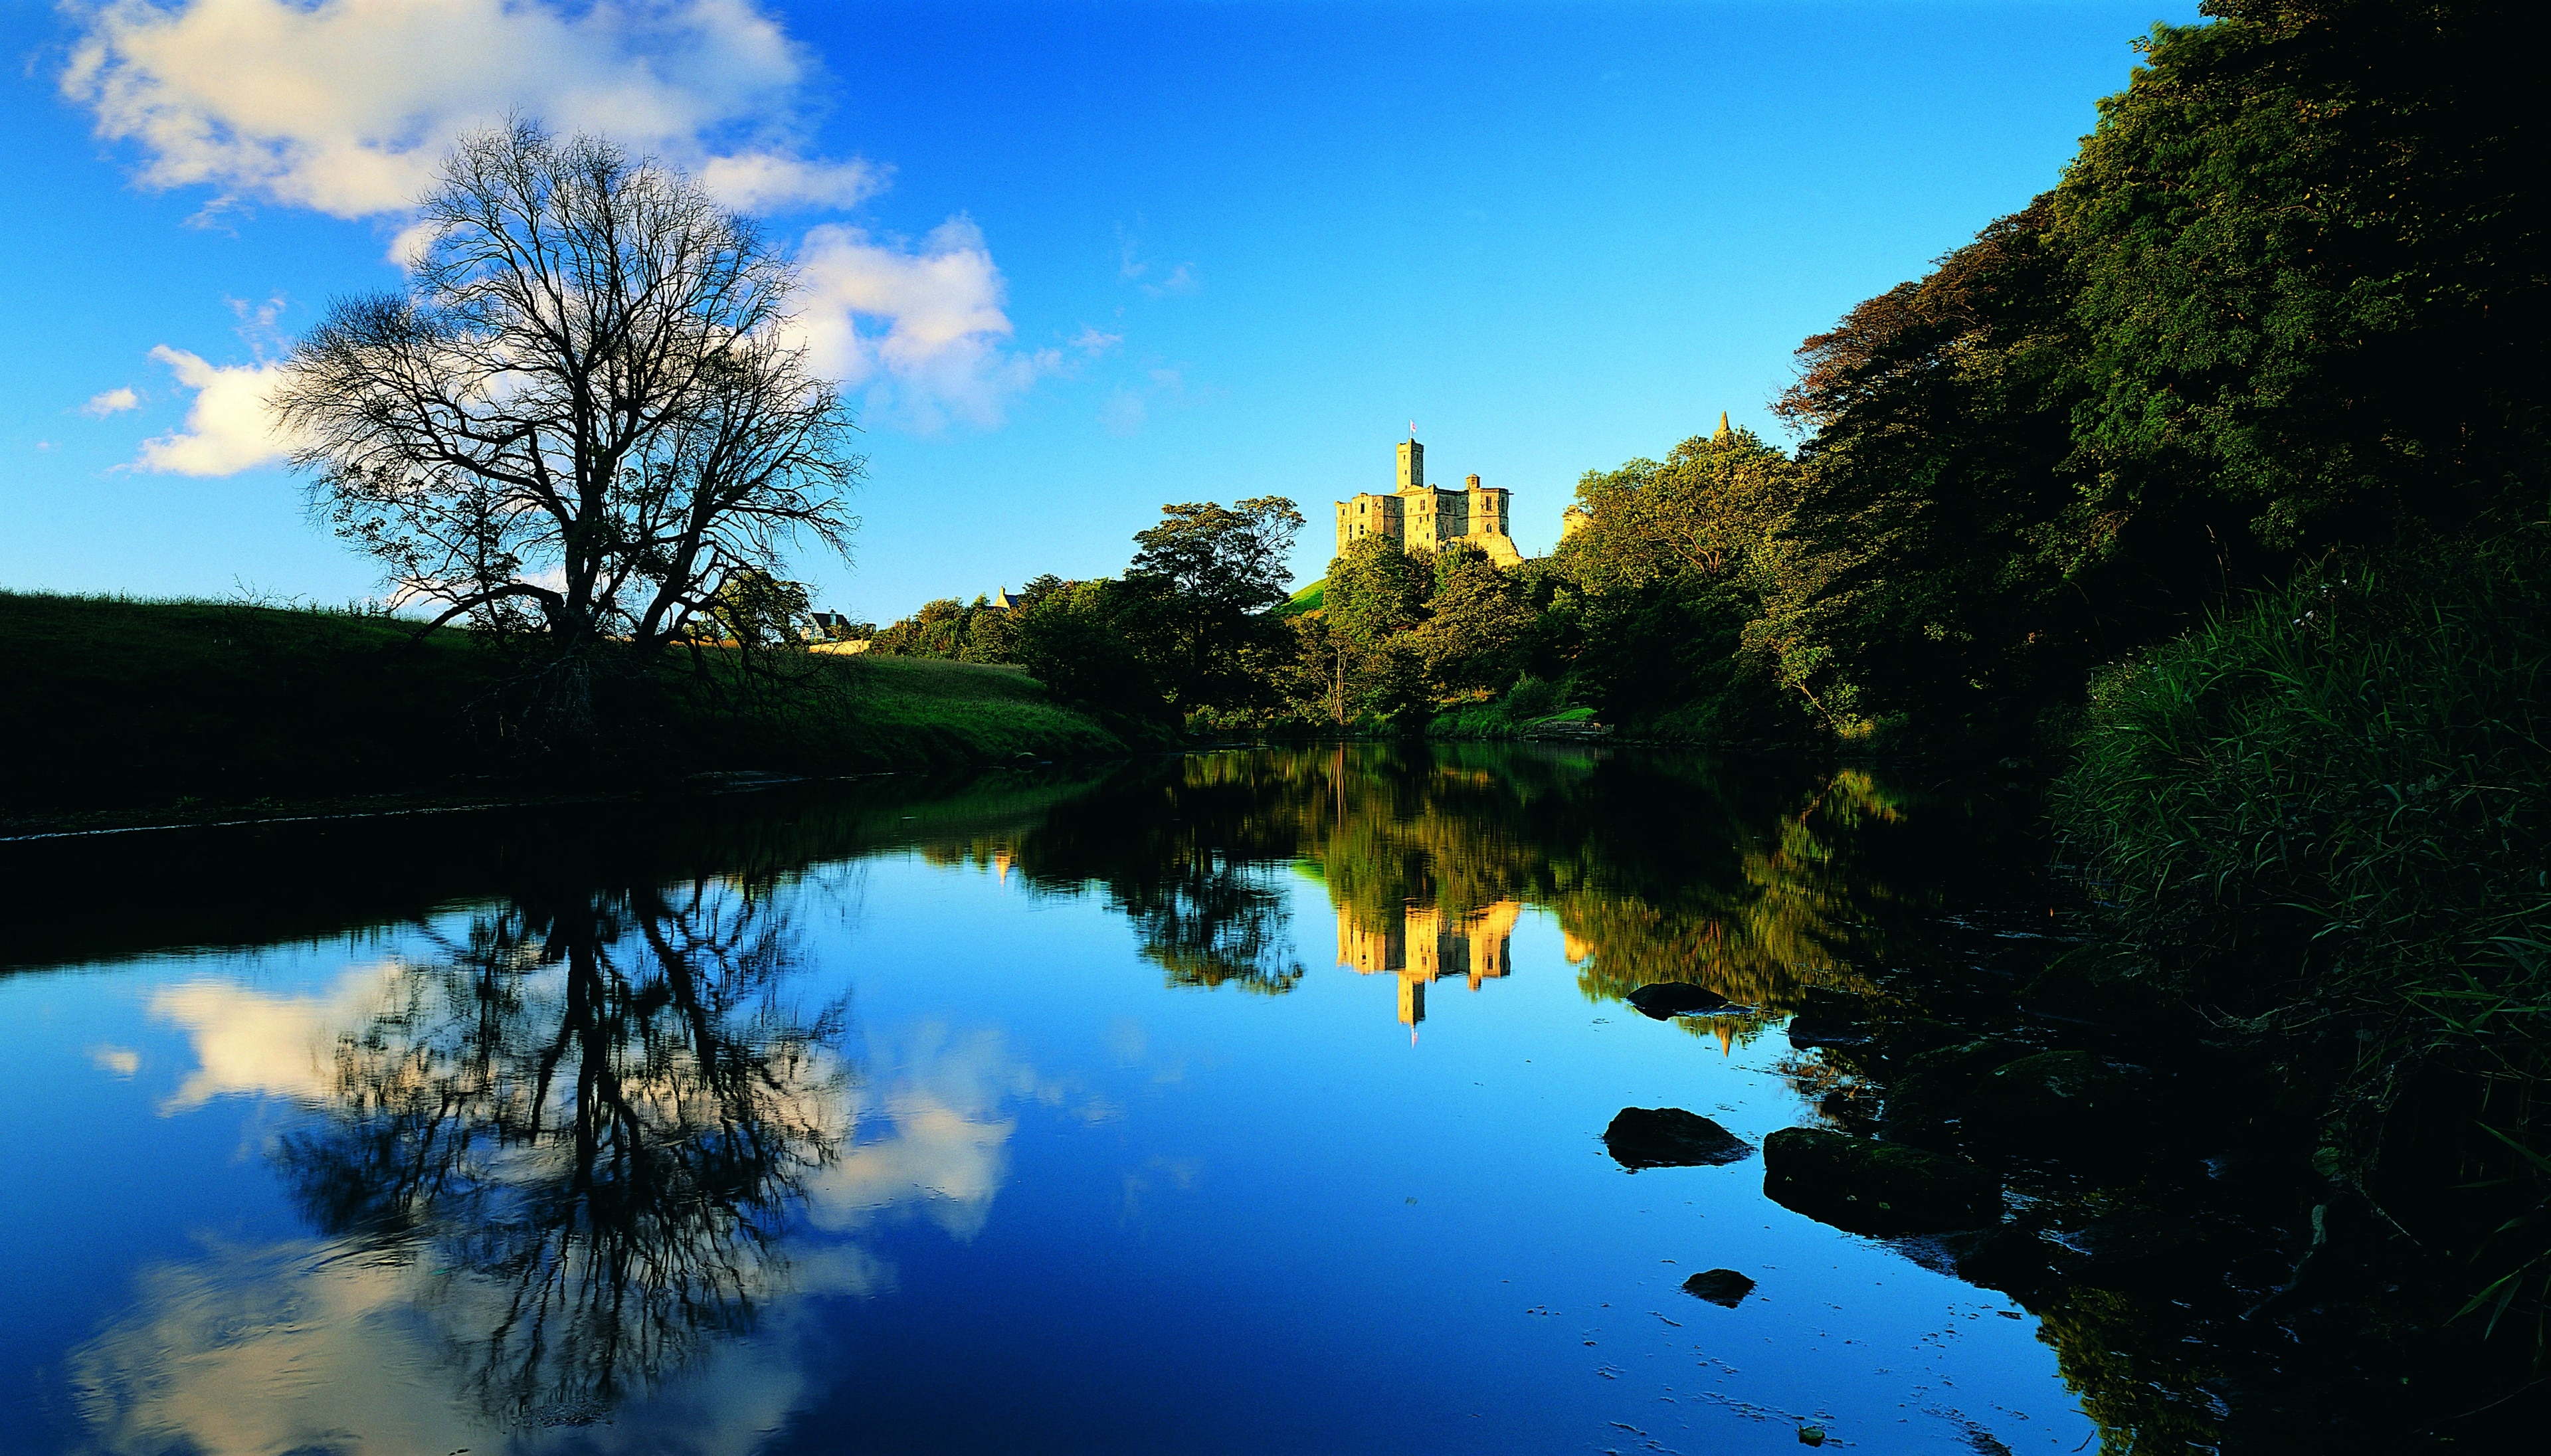 Morpeth, England, United Kingdom